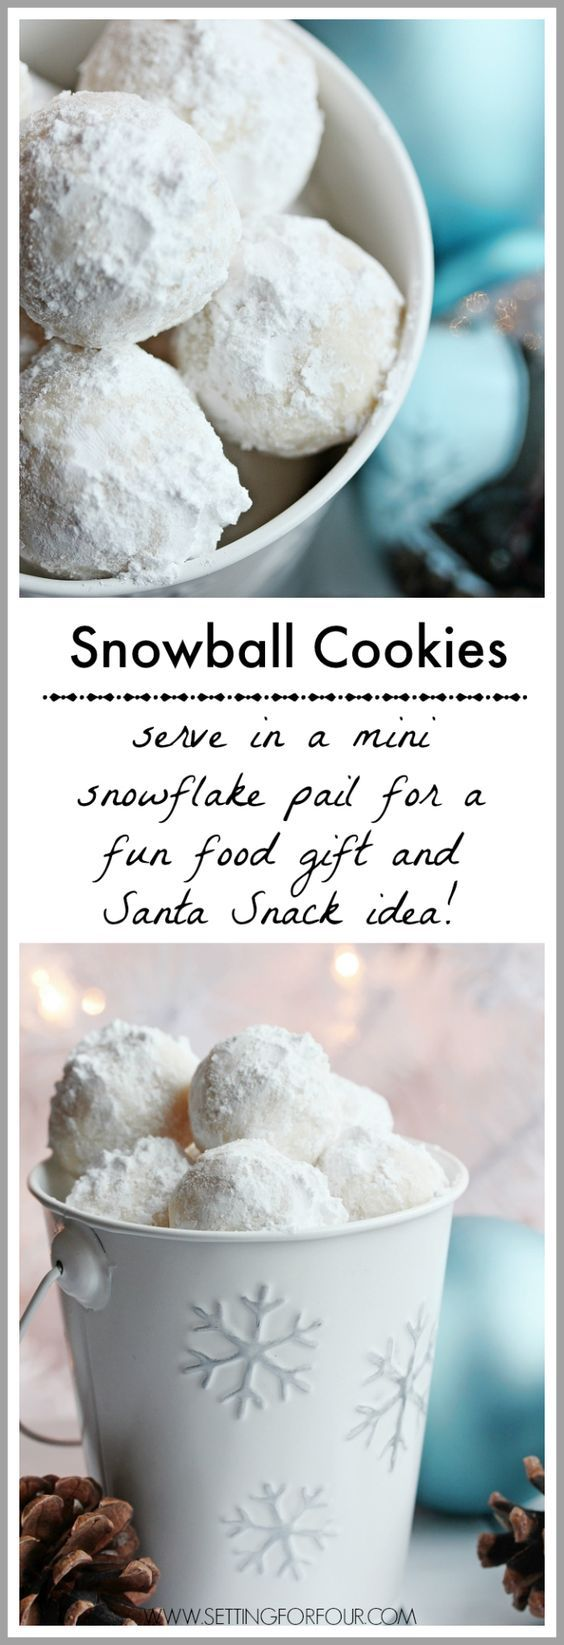 These Snowball Cookies look like adorable mini snowballs! Fabulous DIY Christmas gift Idea and Santa Snack idea too! www.settingforfour.com